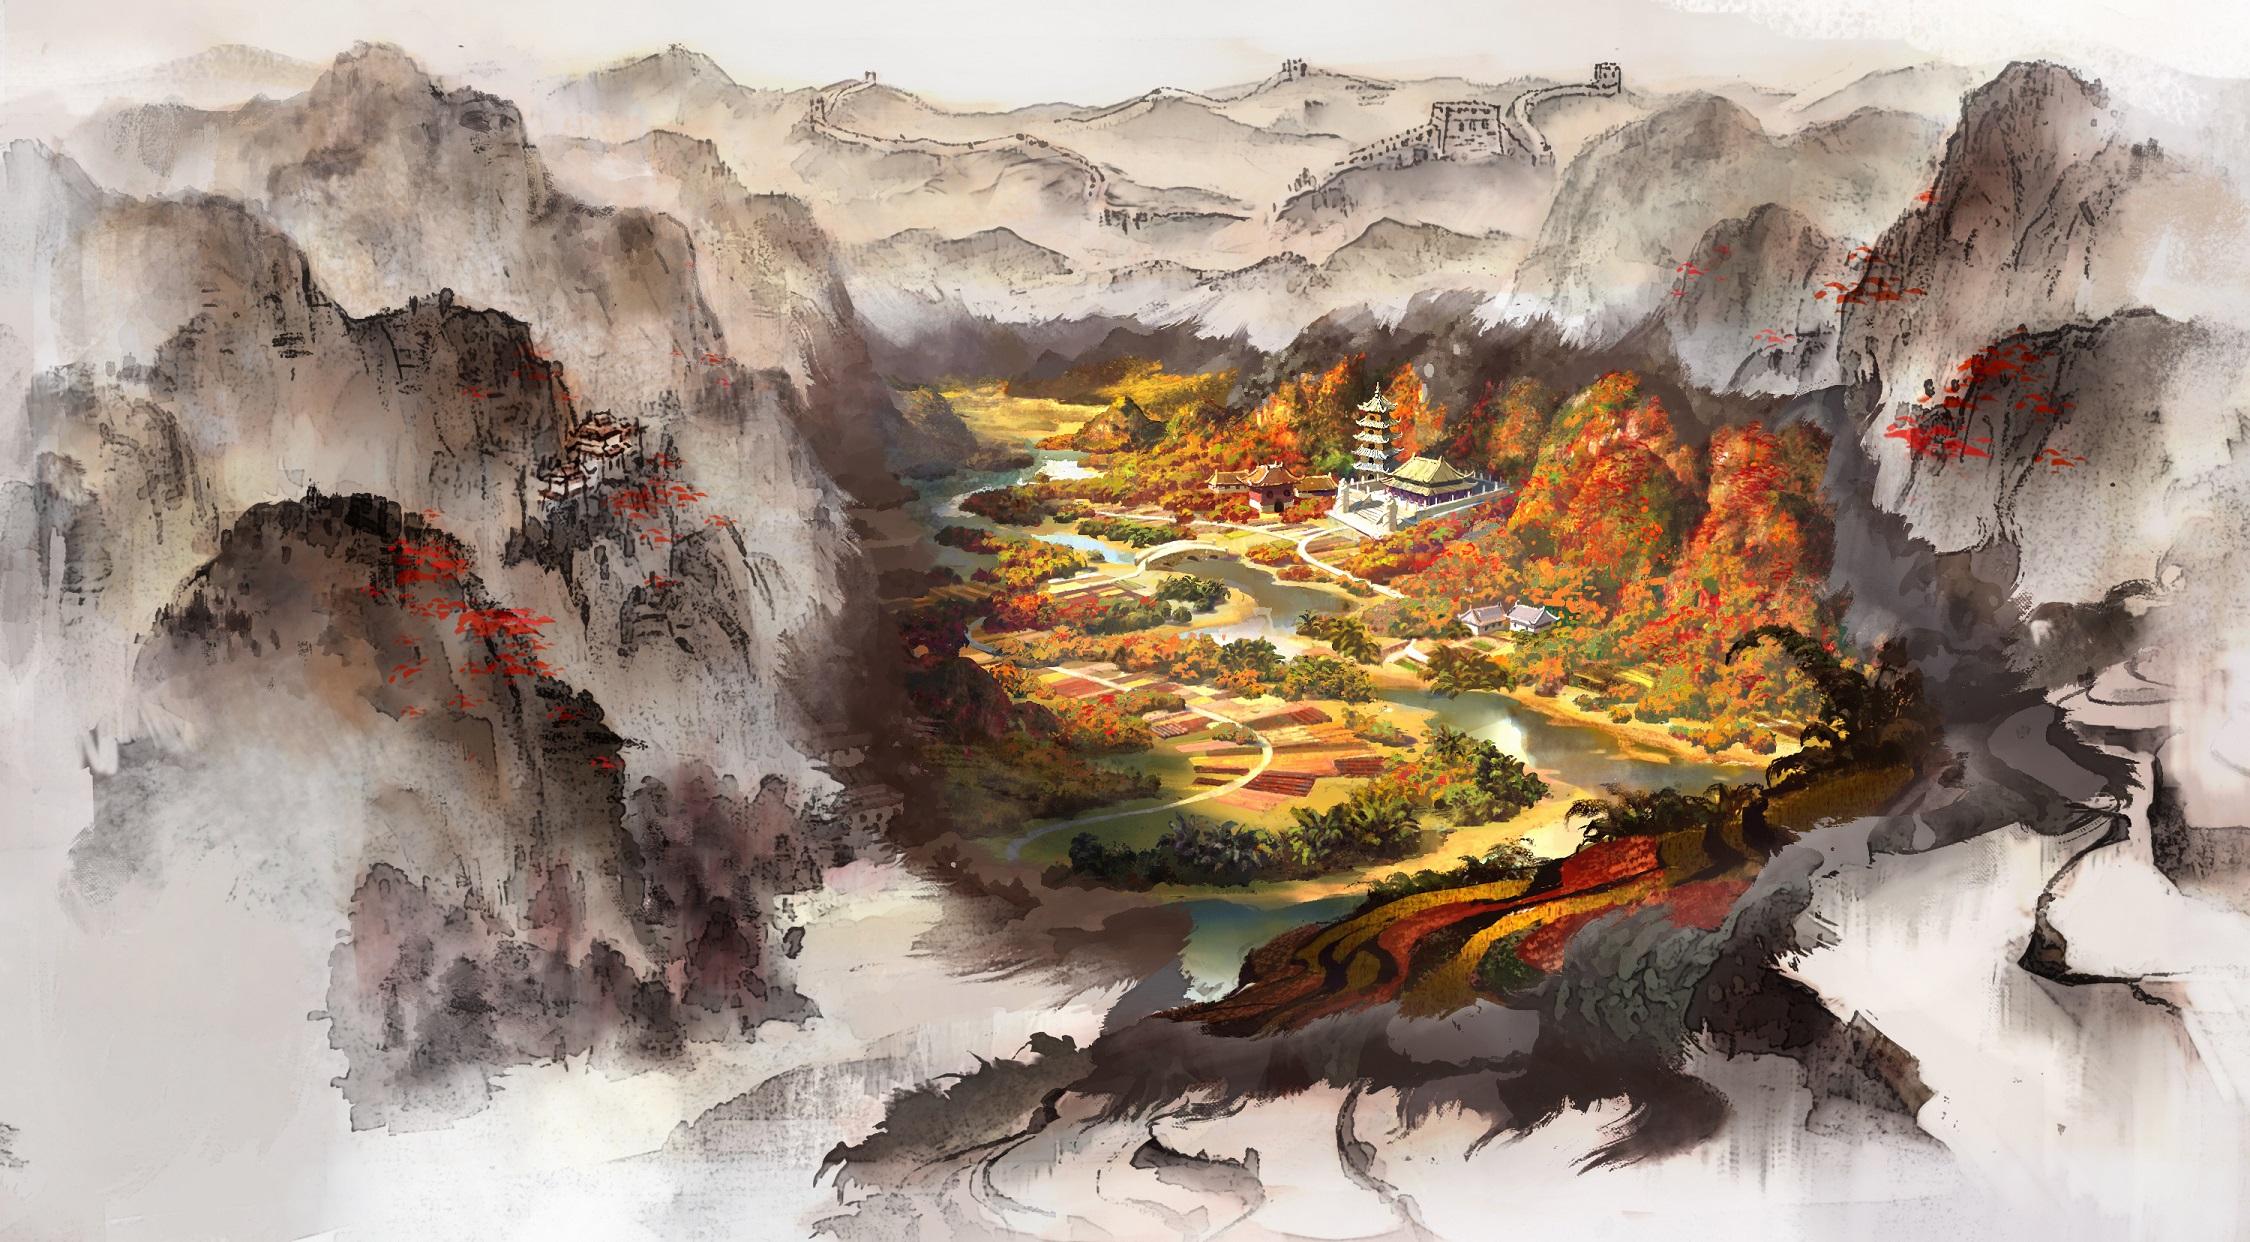 Total War: THREE KINGDOMS – Klasik Mod Hakkında Sorulan 6 Soru